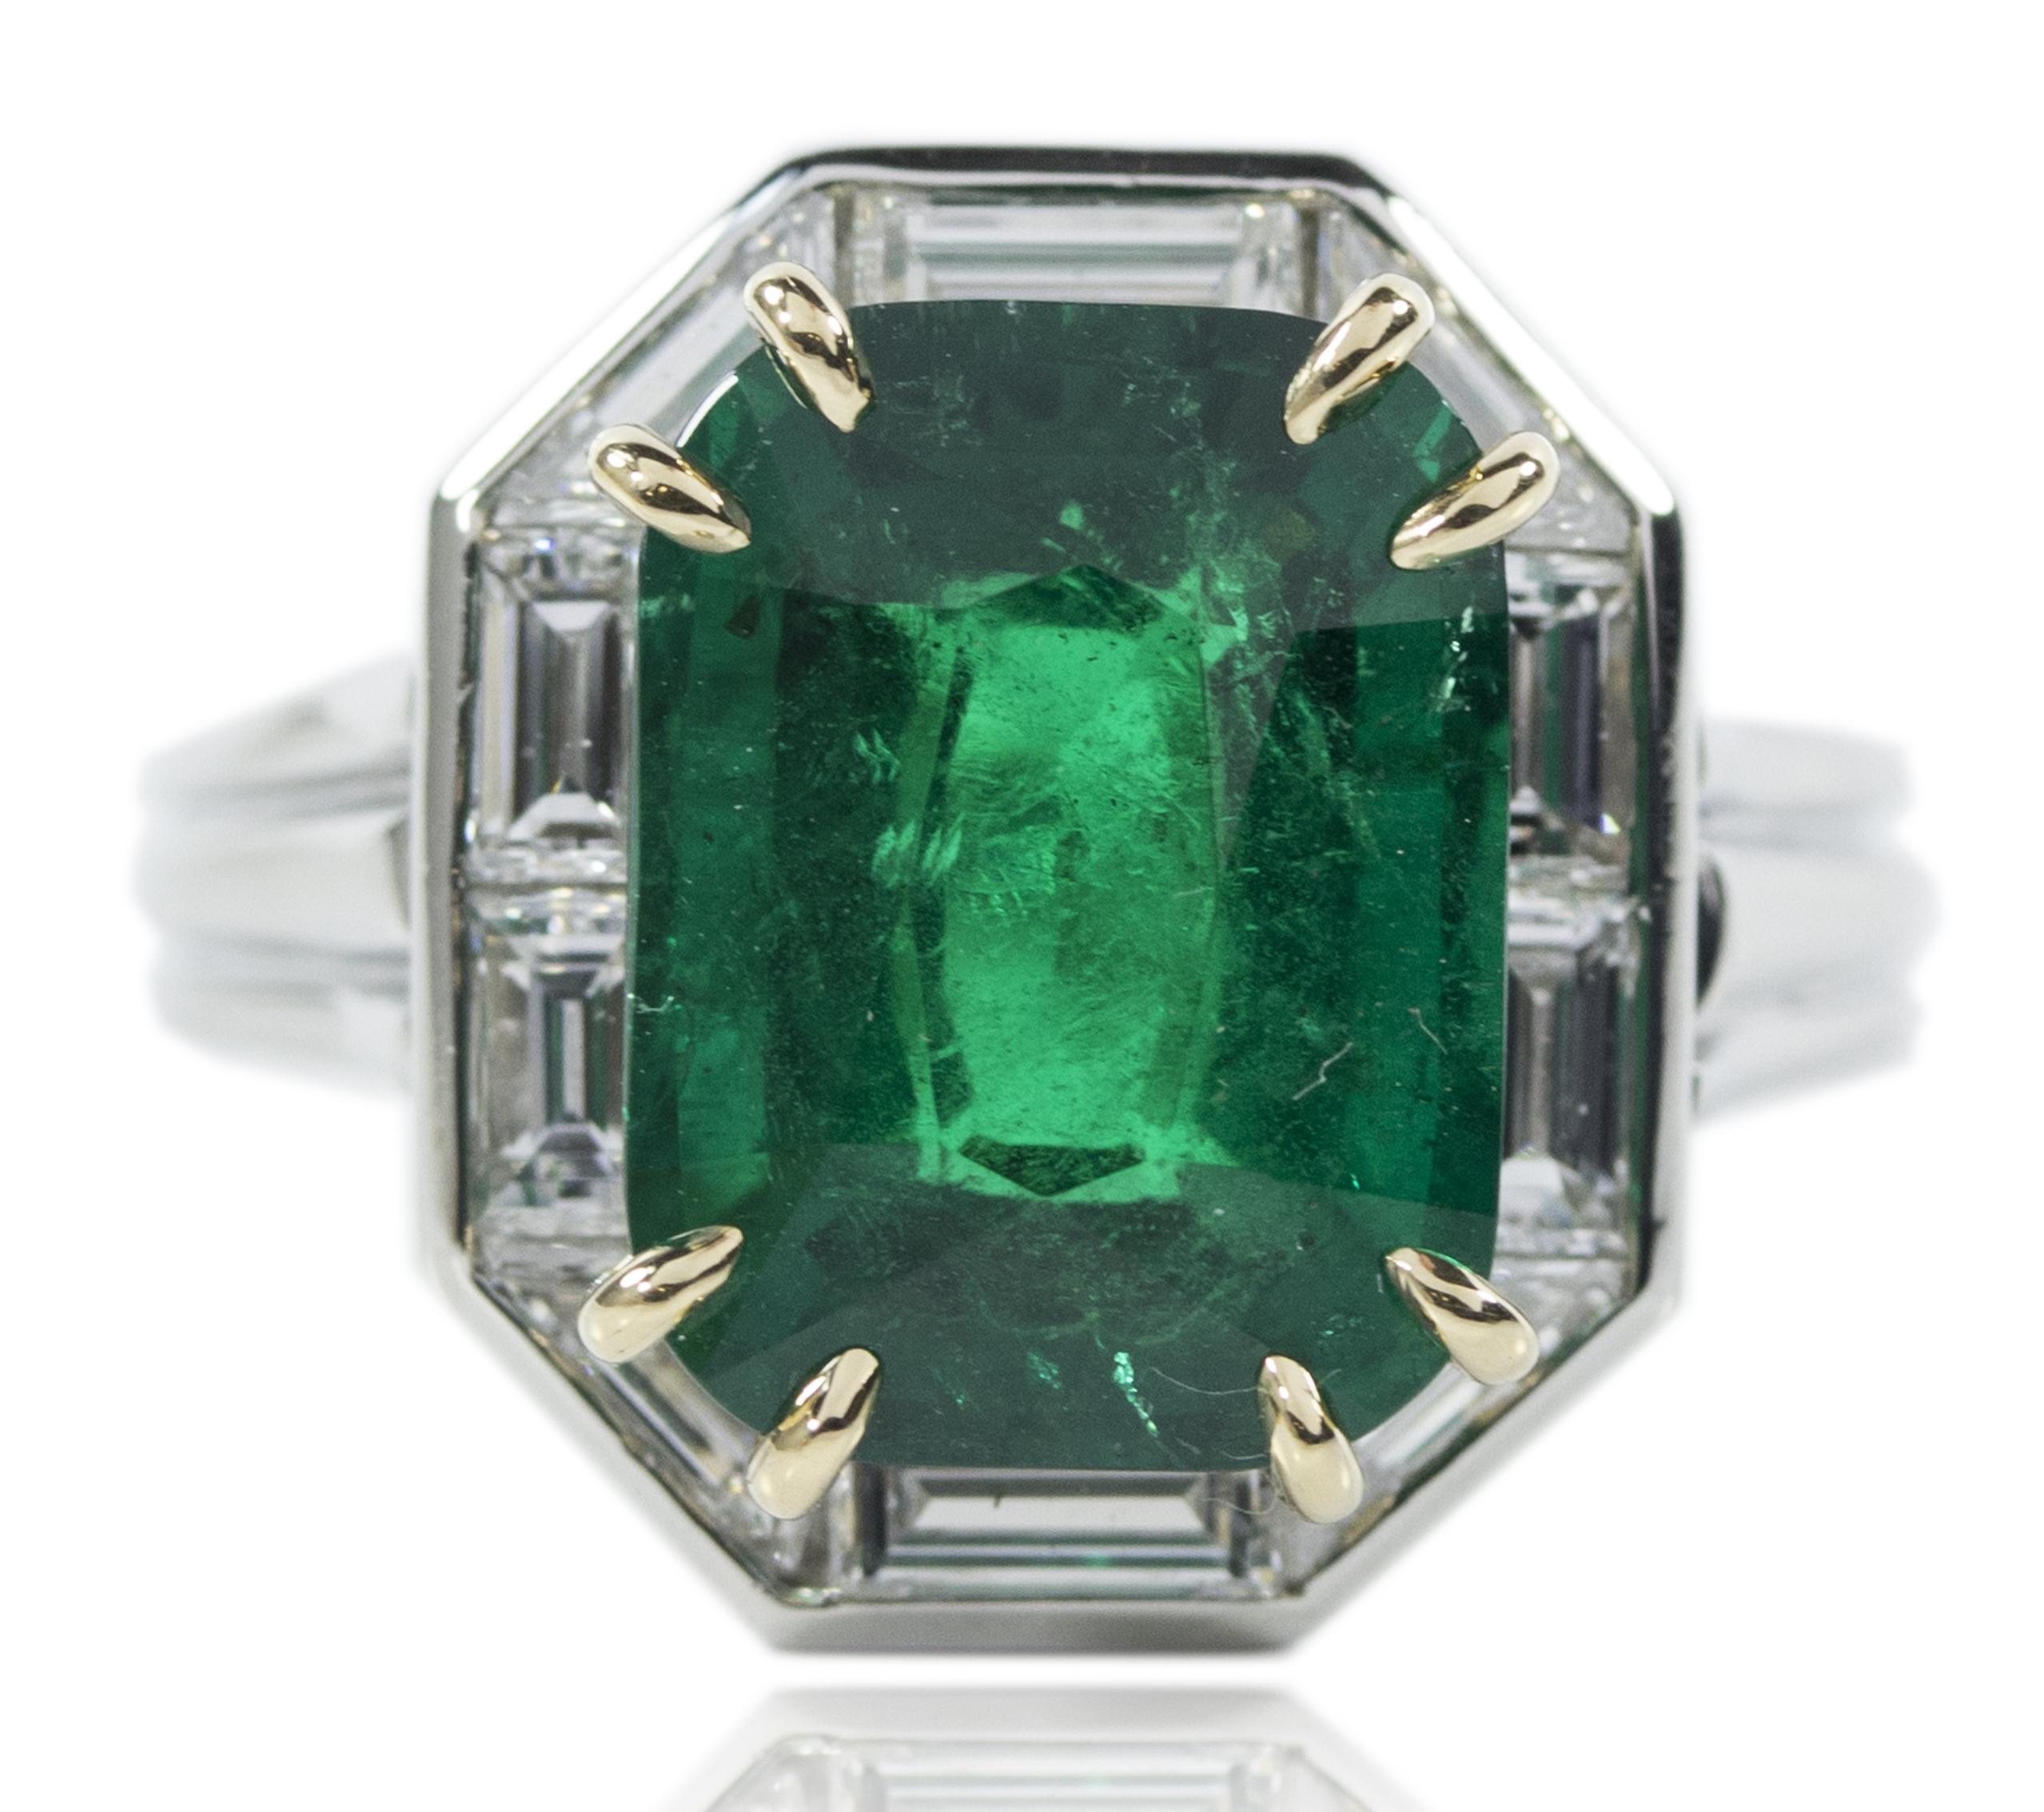 Oscar Heyman platinum emerald ring | JCK On Your Market